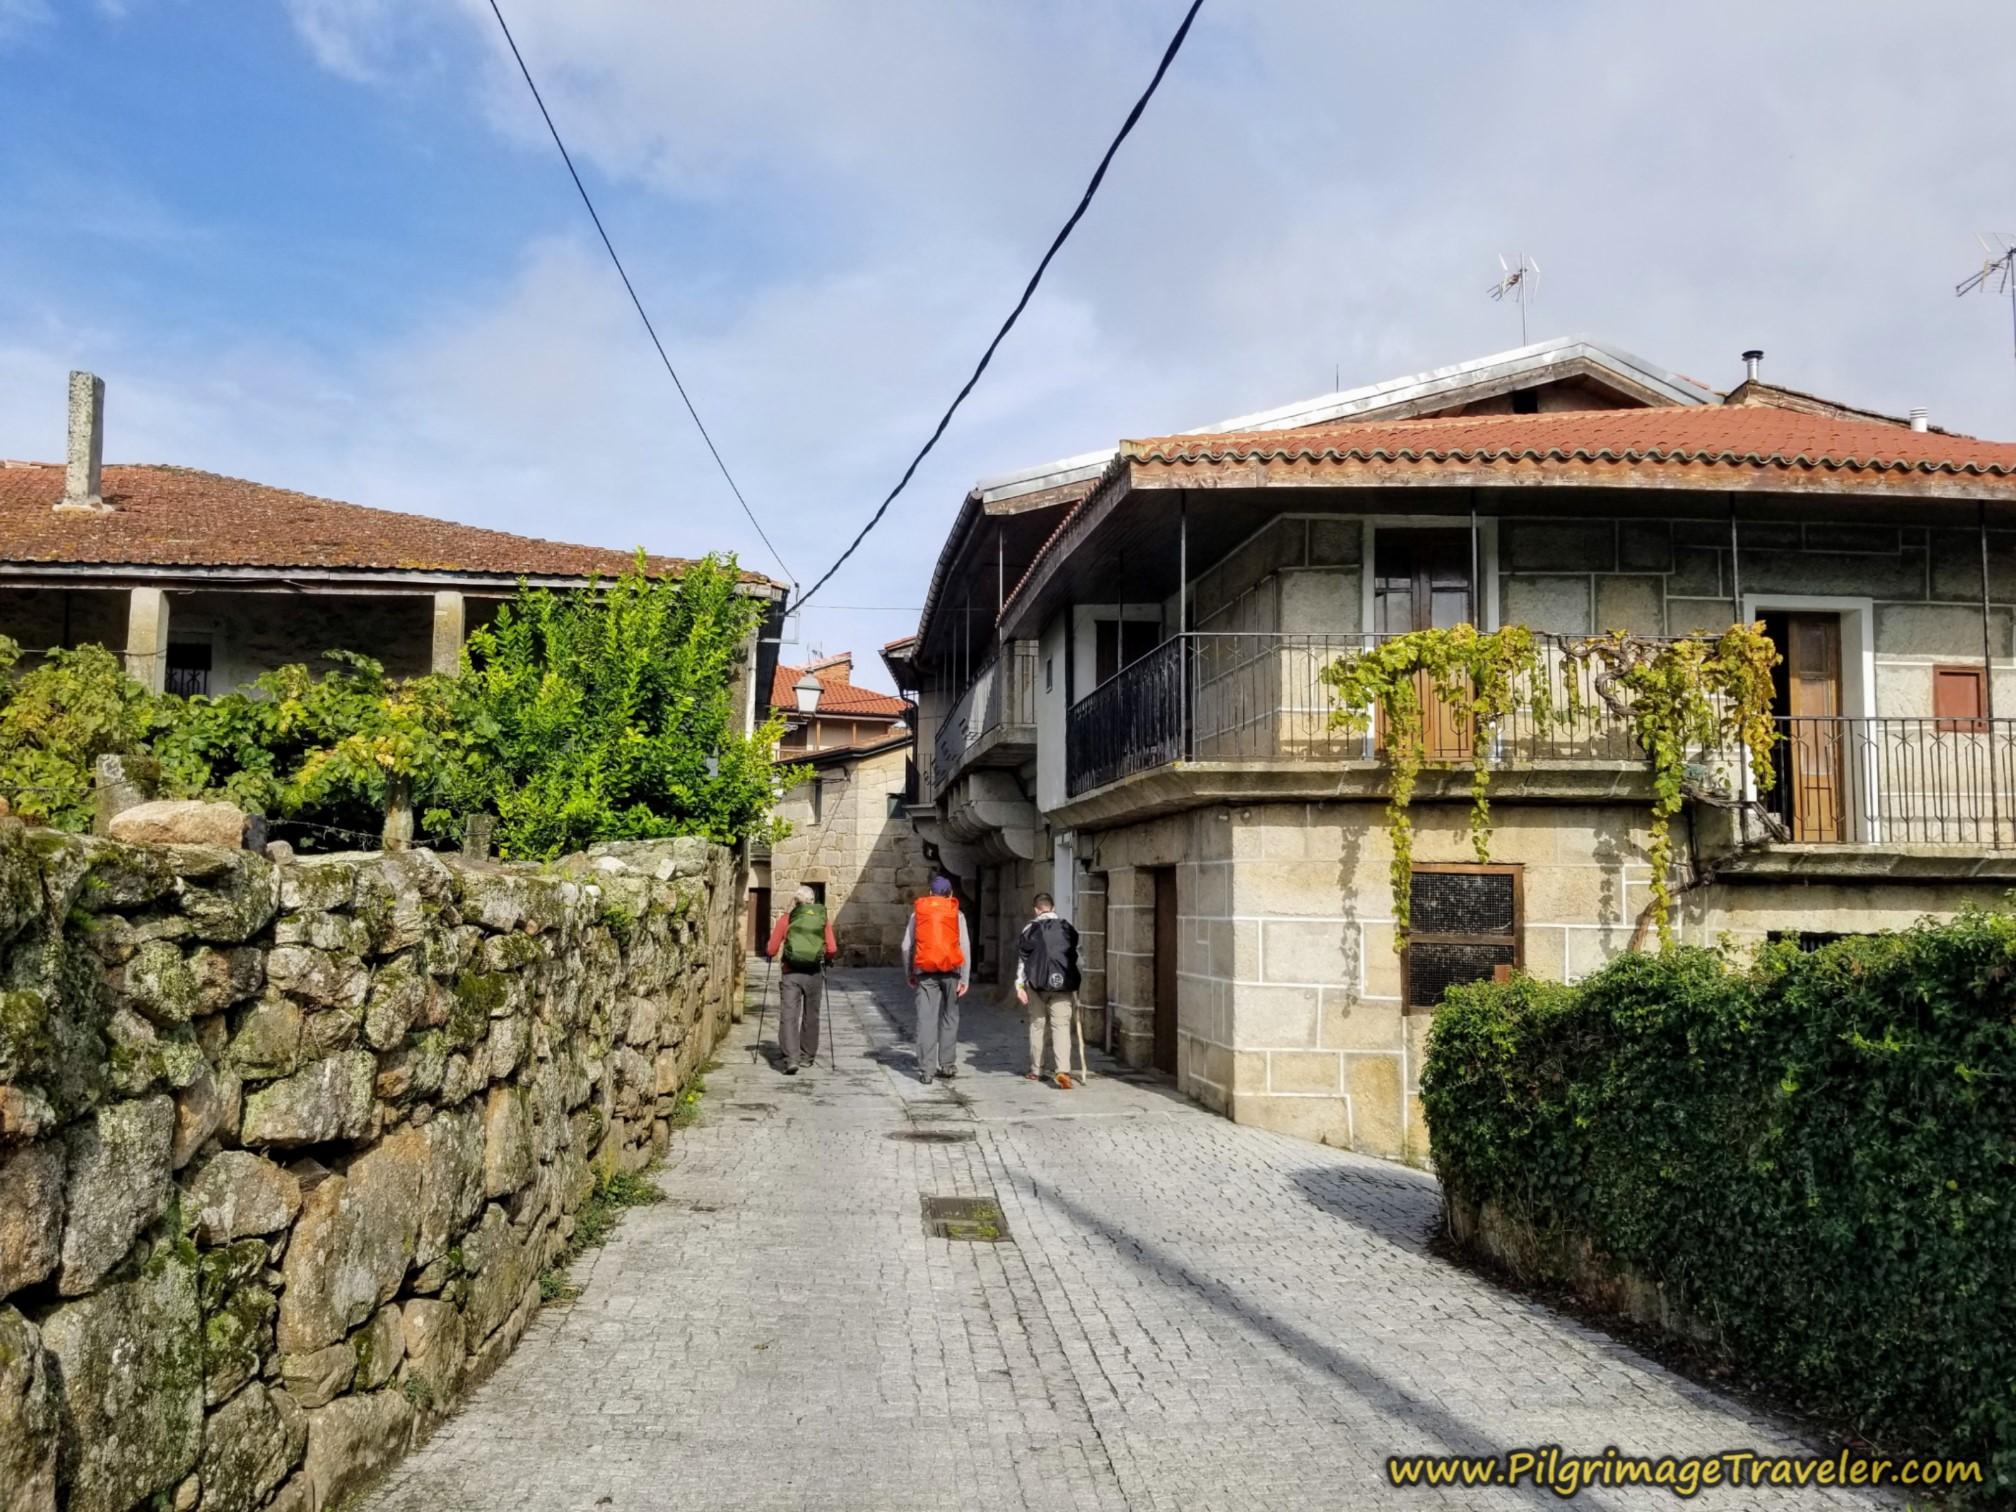 Entering the Medieval Town of Seixalbo